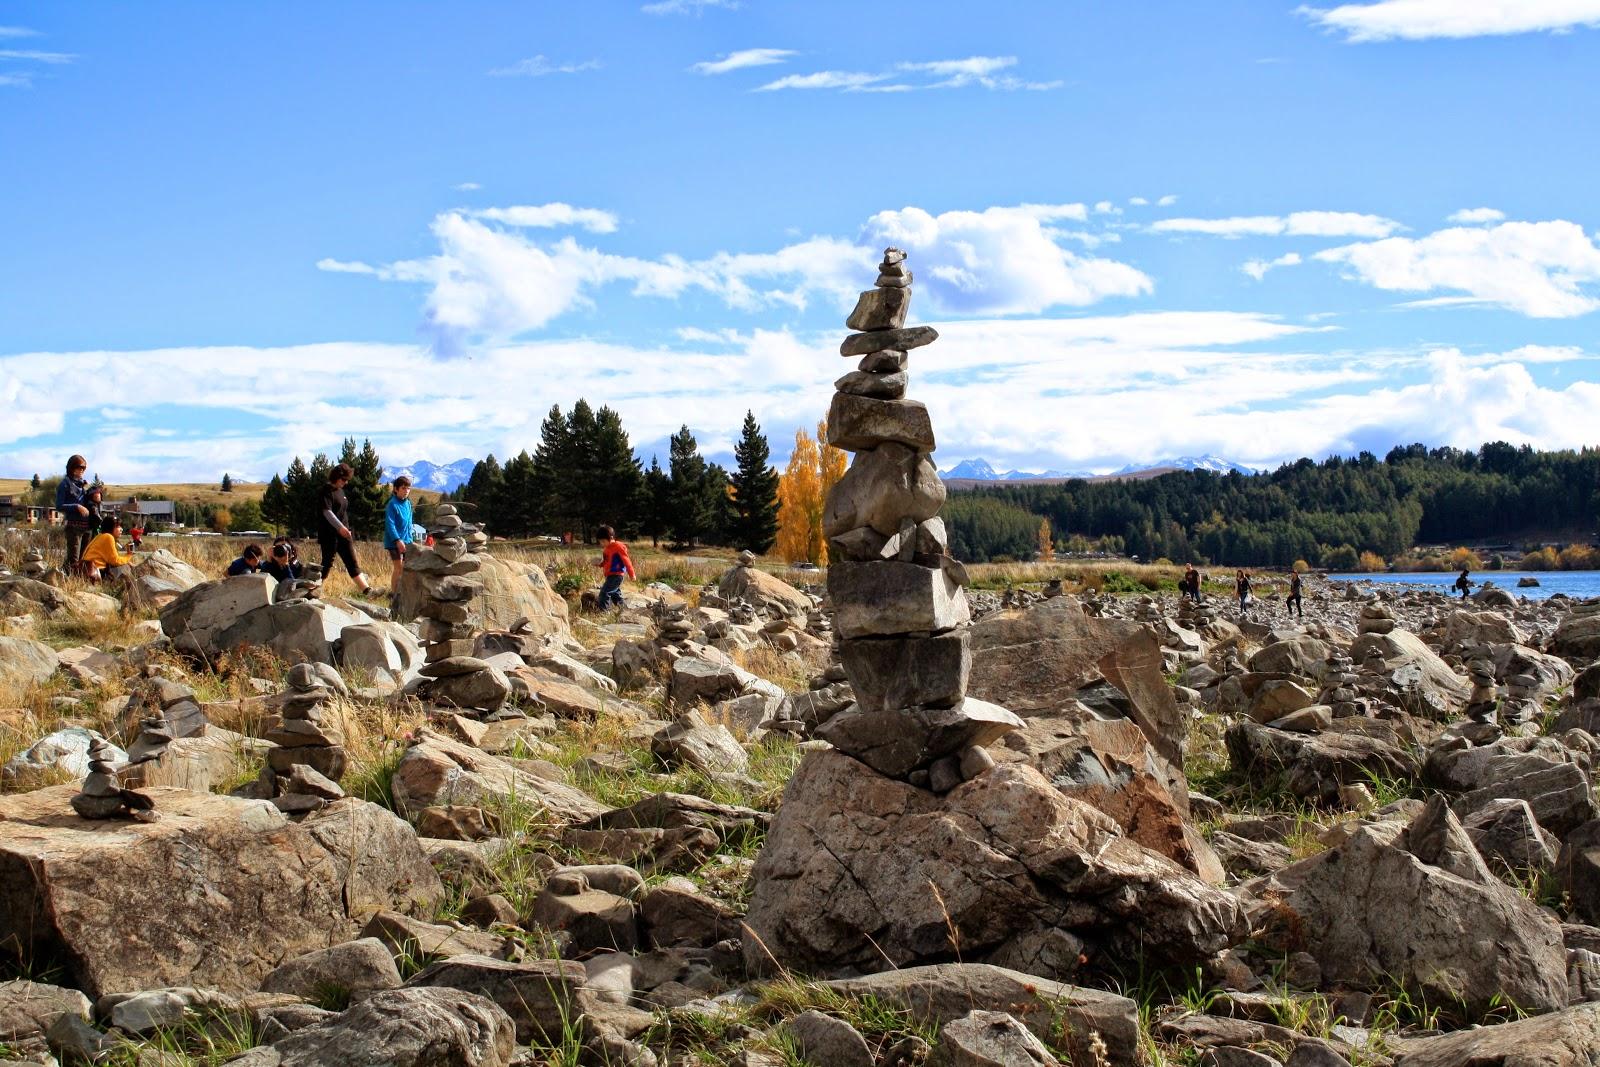 More standing stones at Lake Tekapo.